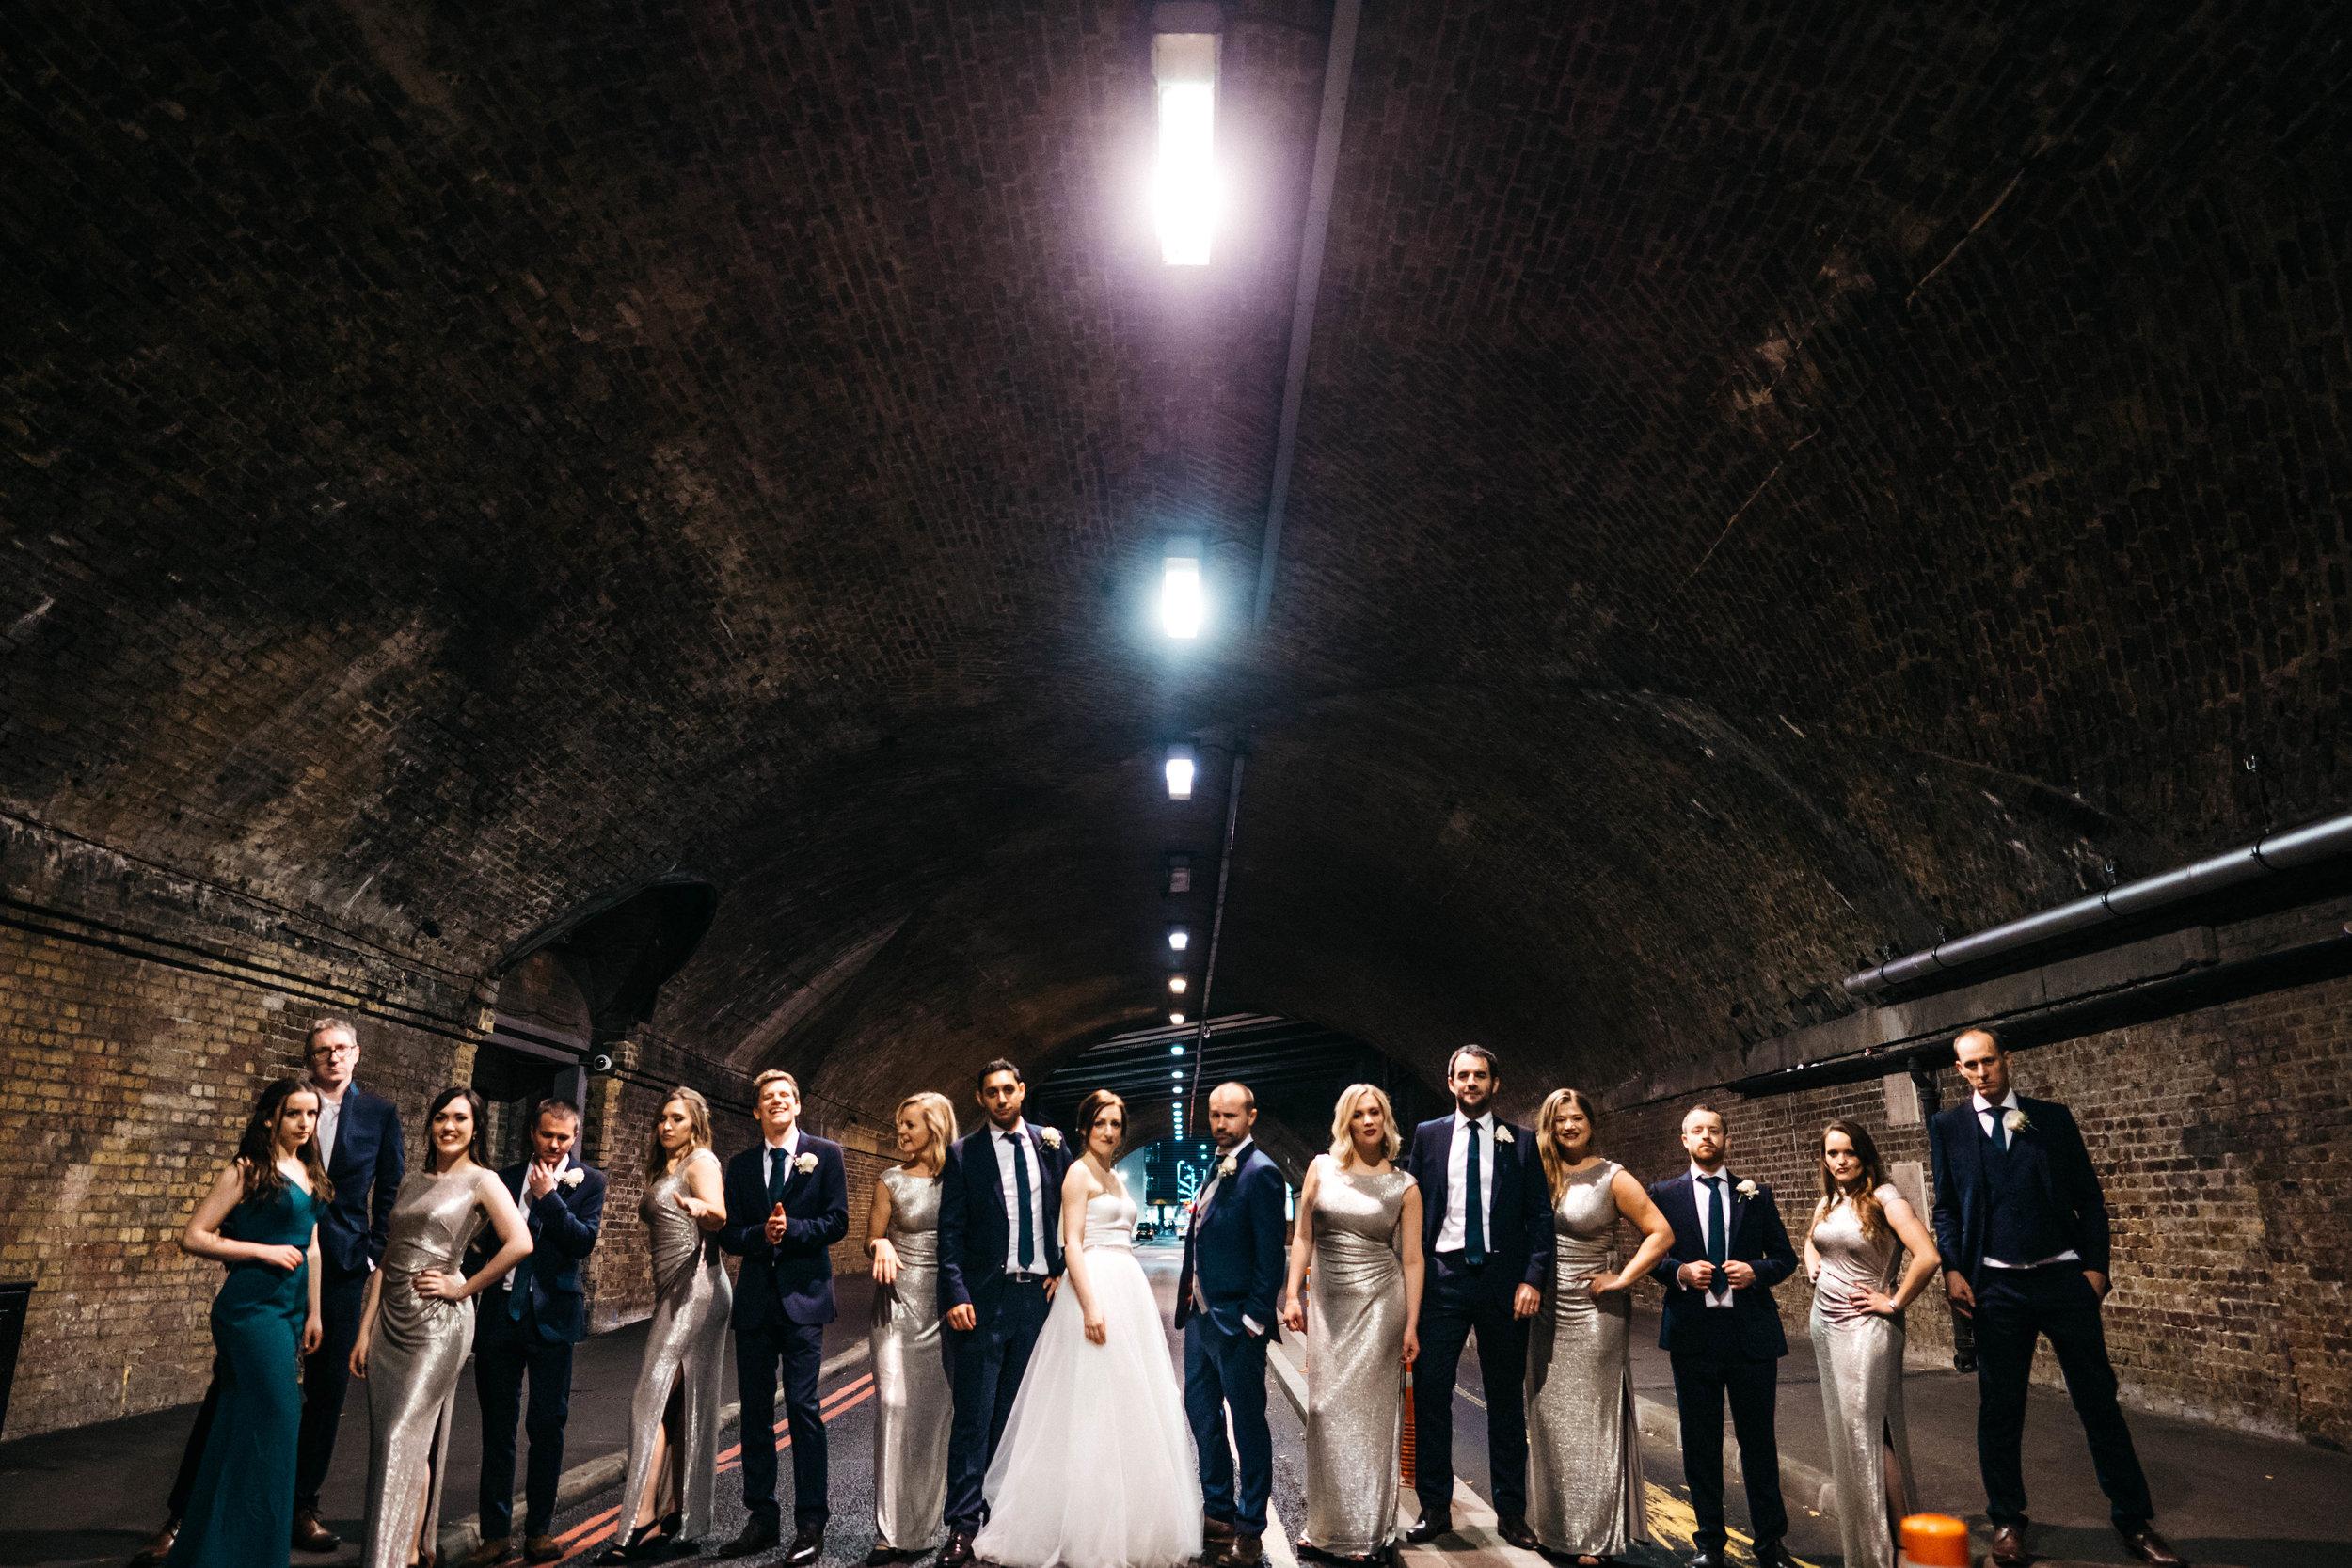 kent-wedding-photographer-107028.jpg